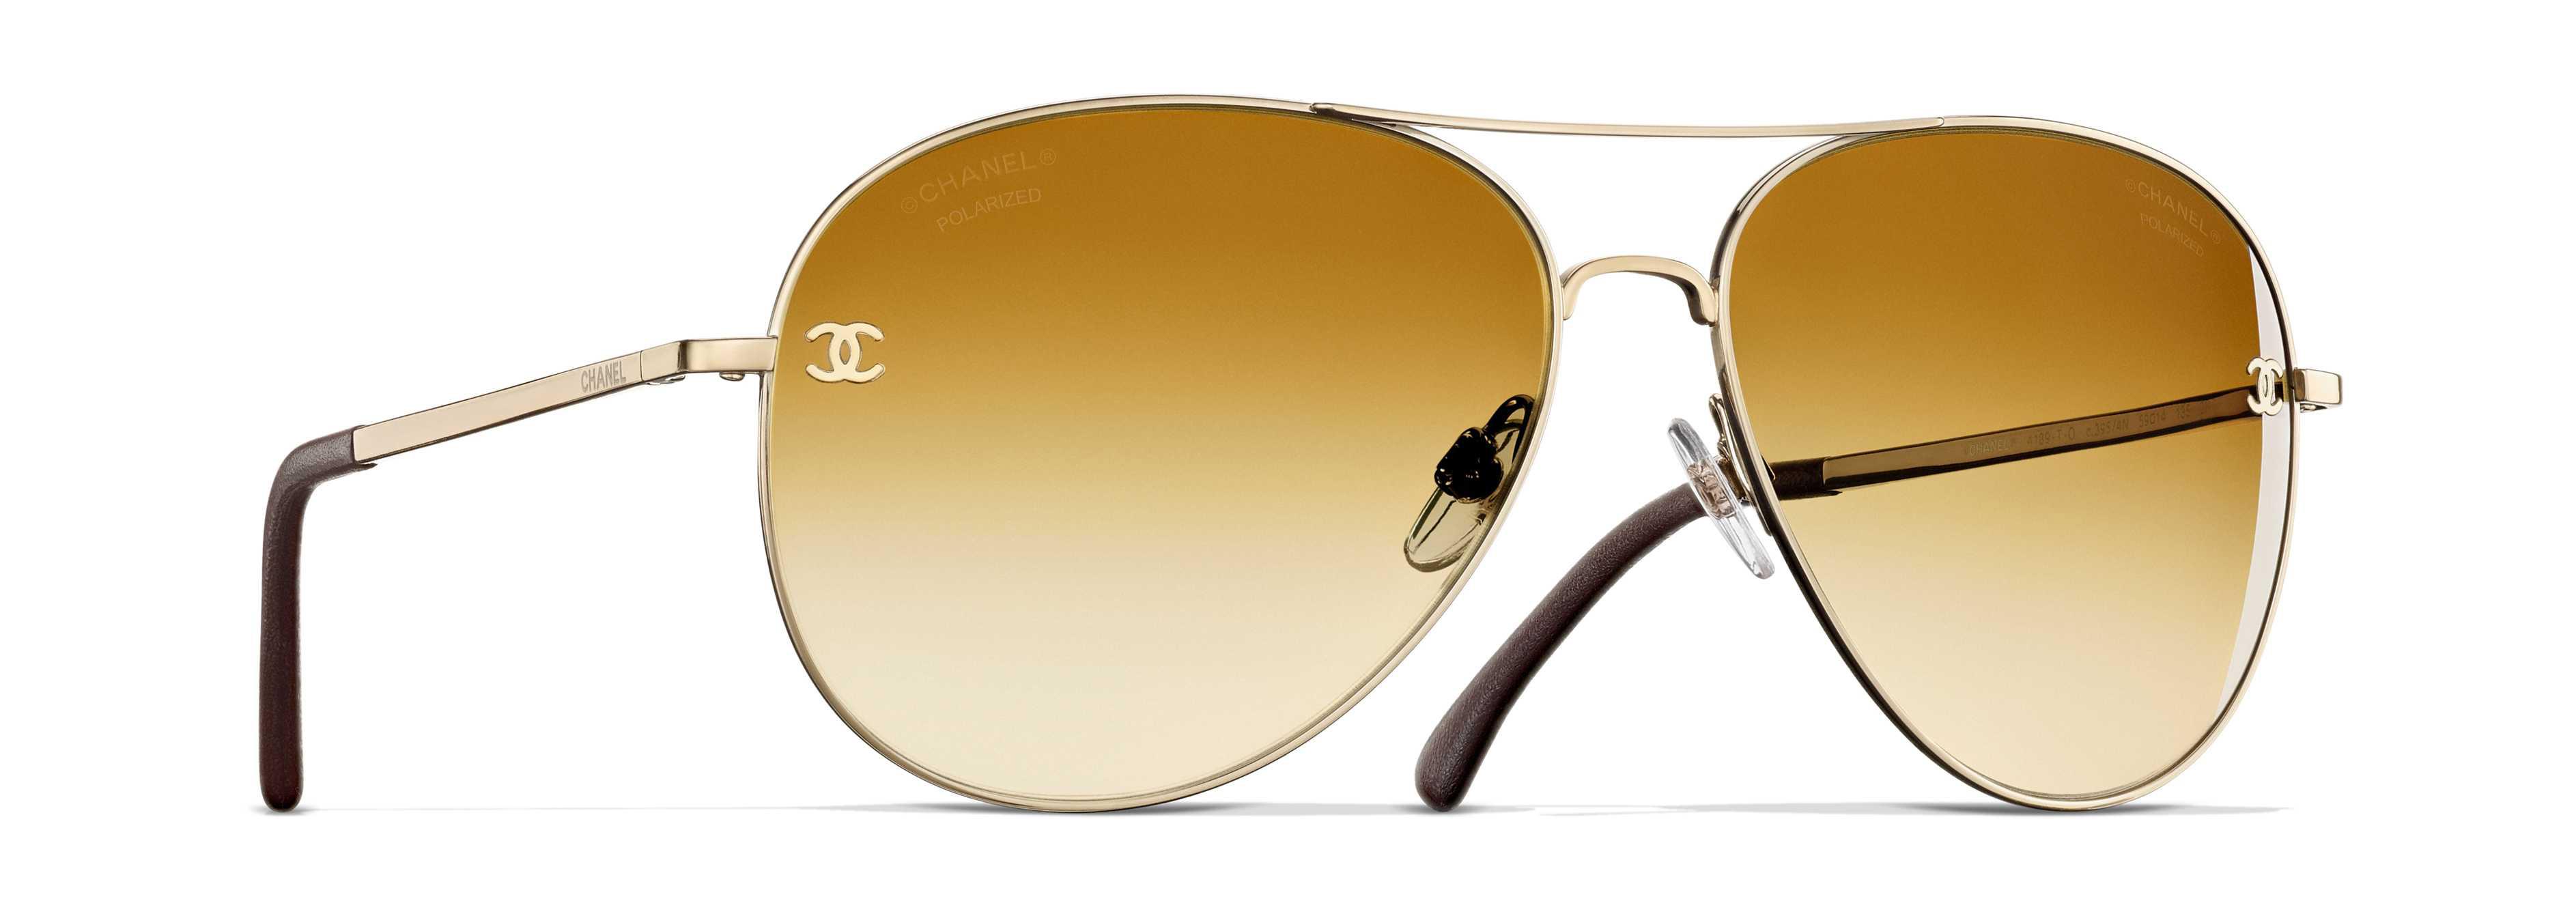 Sunglasses Women CHANEL CH 4189TQ C395S9 59/14